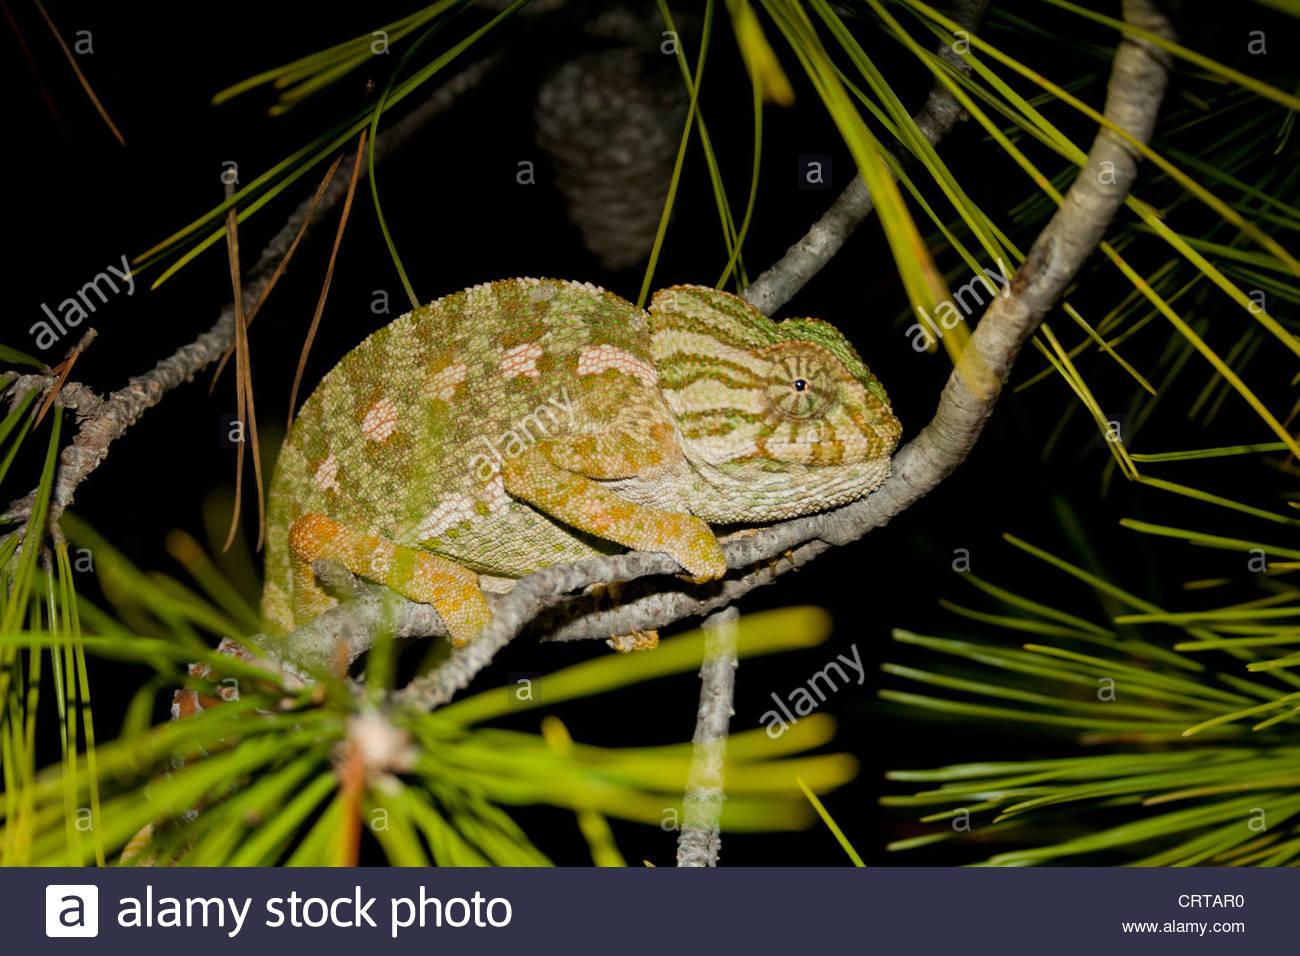 Chamaeleo chamaeleon, chameleon in San Pedro del Pinatar, Murcia, Spagna meridionale. Immagini Stock